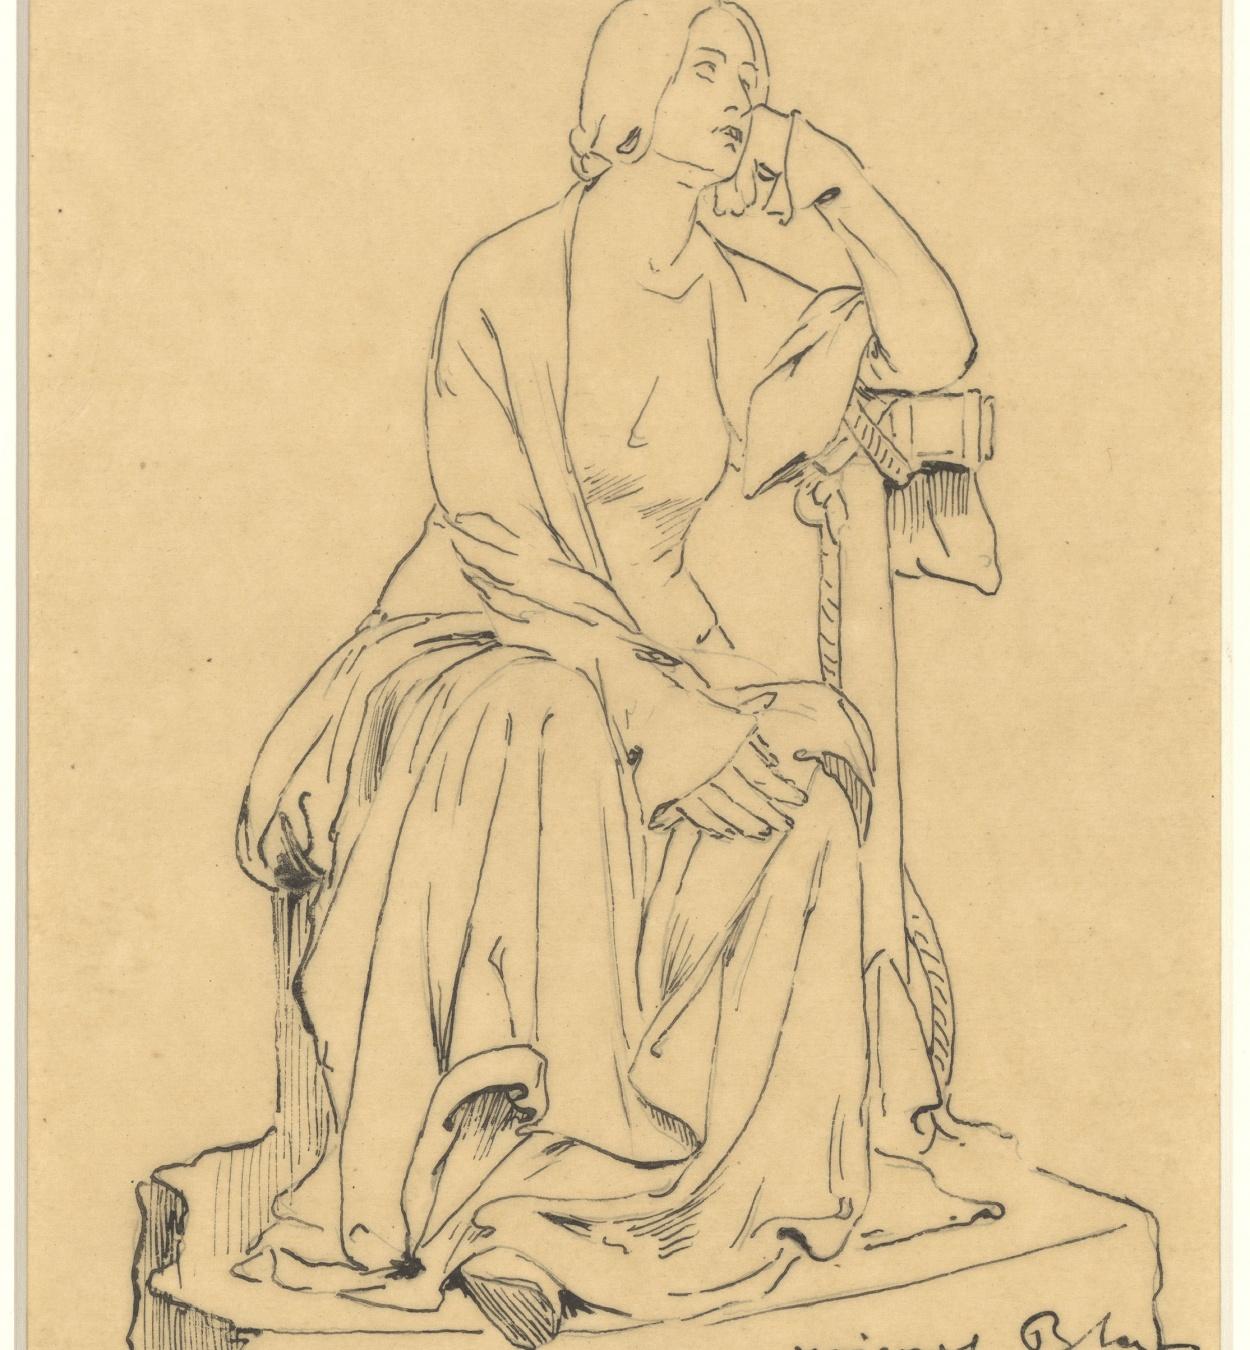 Miquel Blay - Hope, study for the sculpture of the tomb of Joaquín María de Errazu at the Père Lachaise cemetery (Paris) - 1898